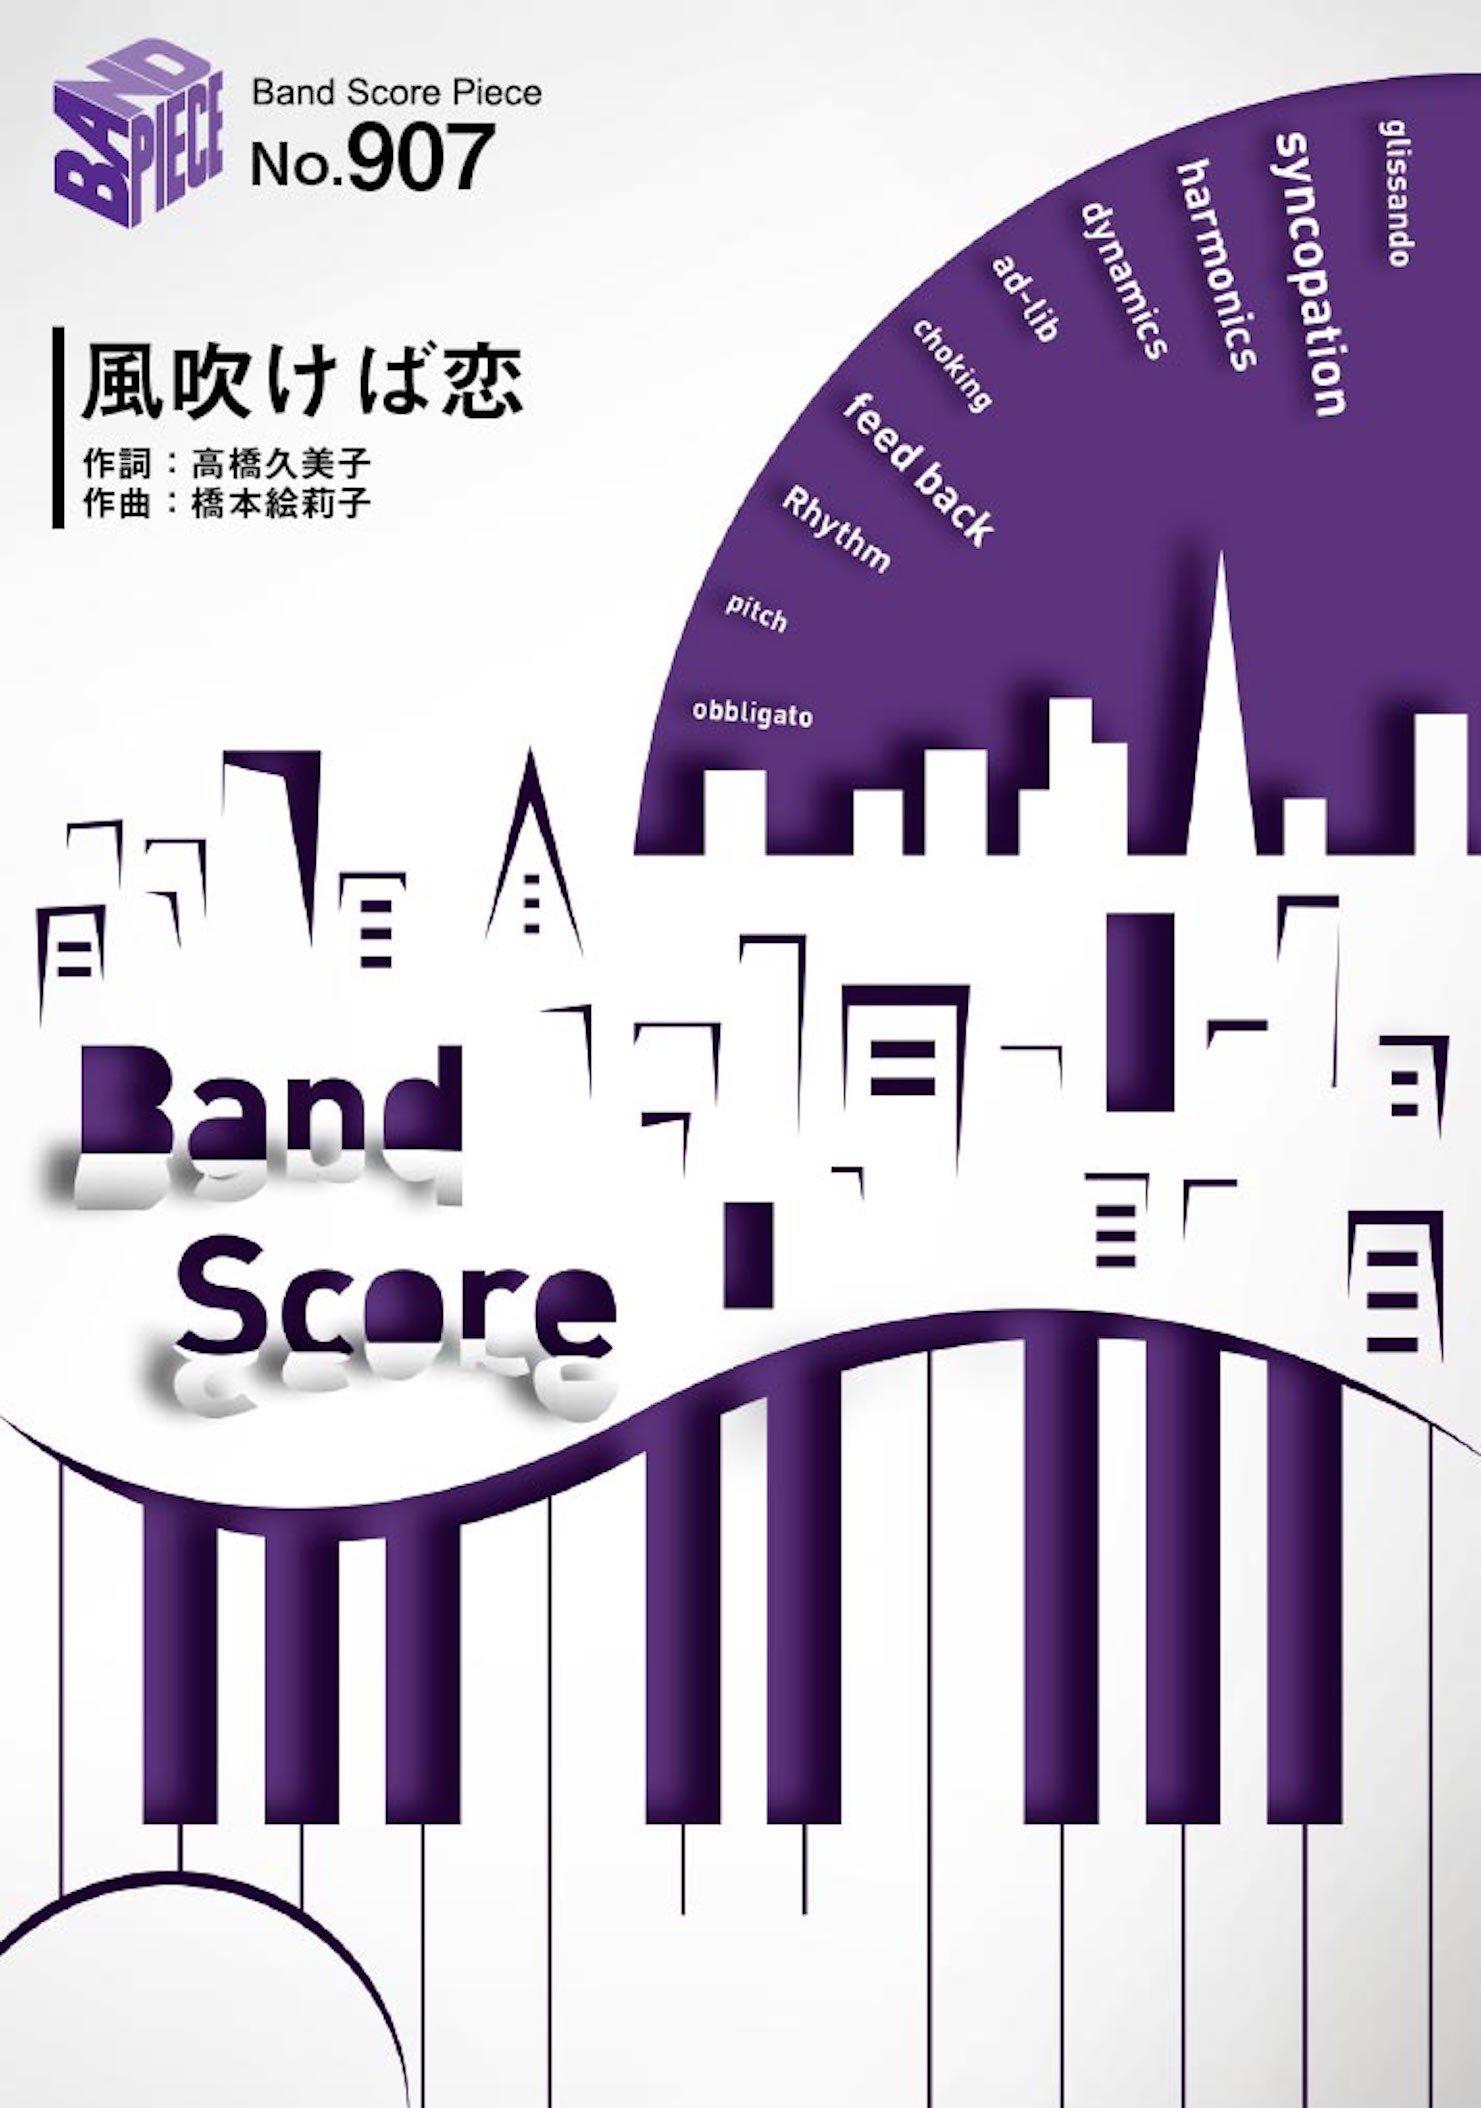 Read Online バンドピース907 風吹けば恋 by チャットモンチー (Band Piece Series) pdf epub